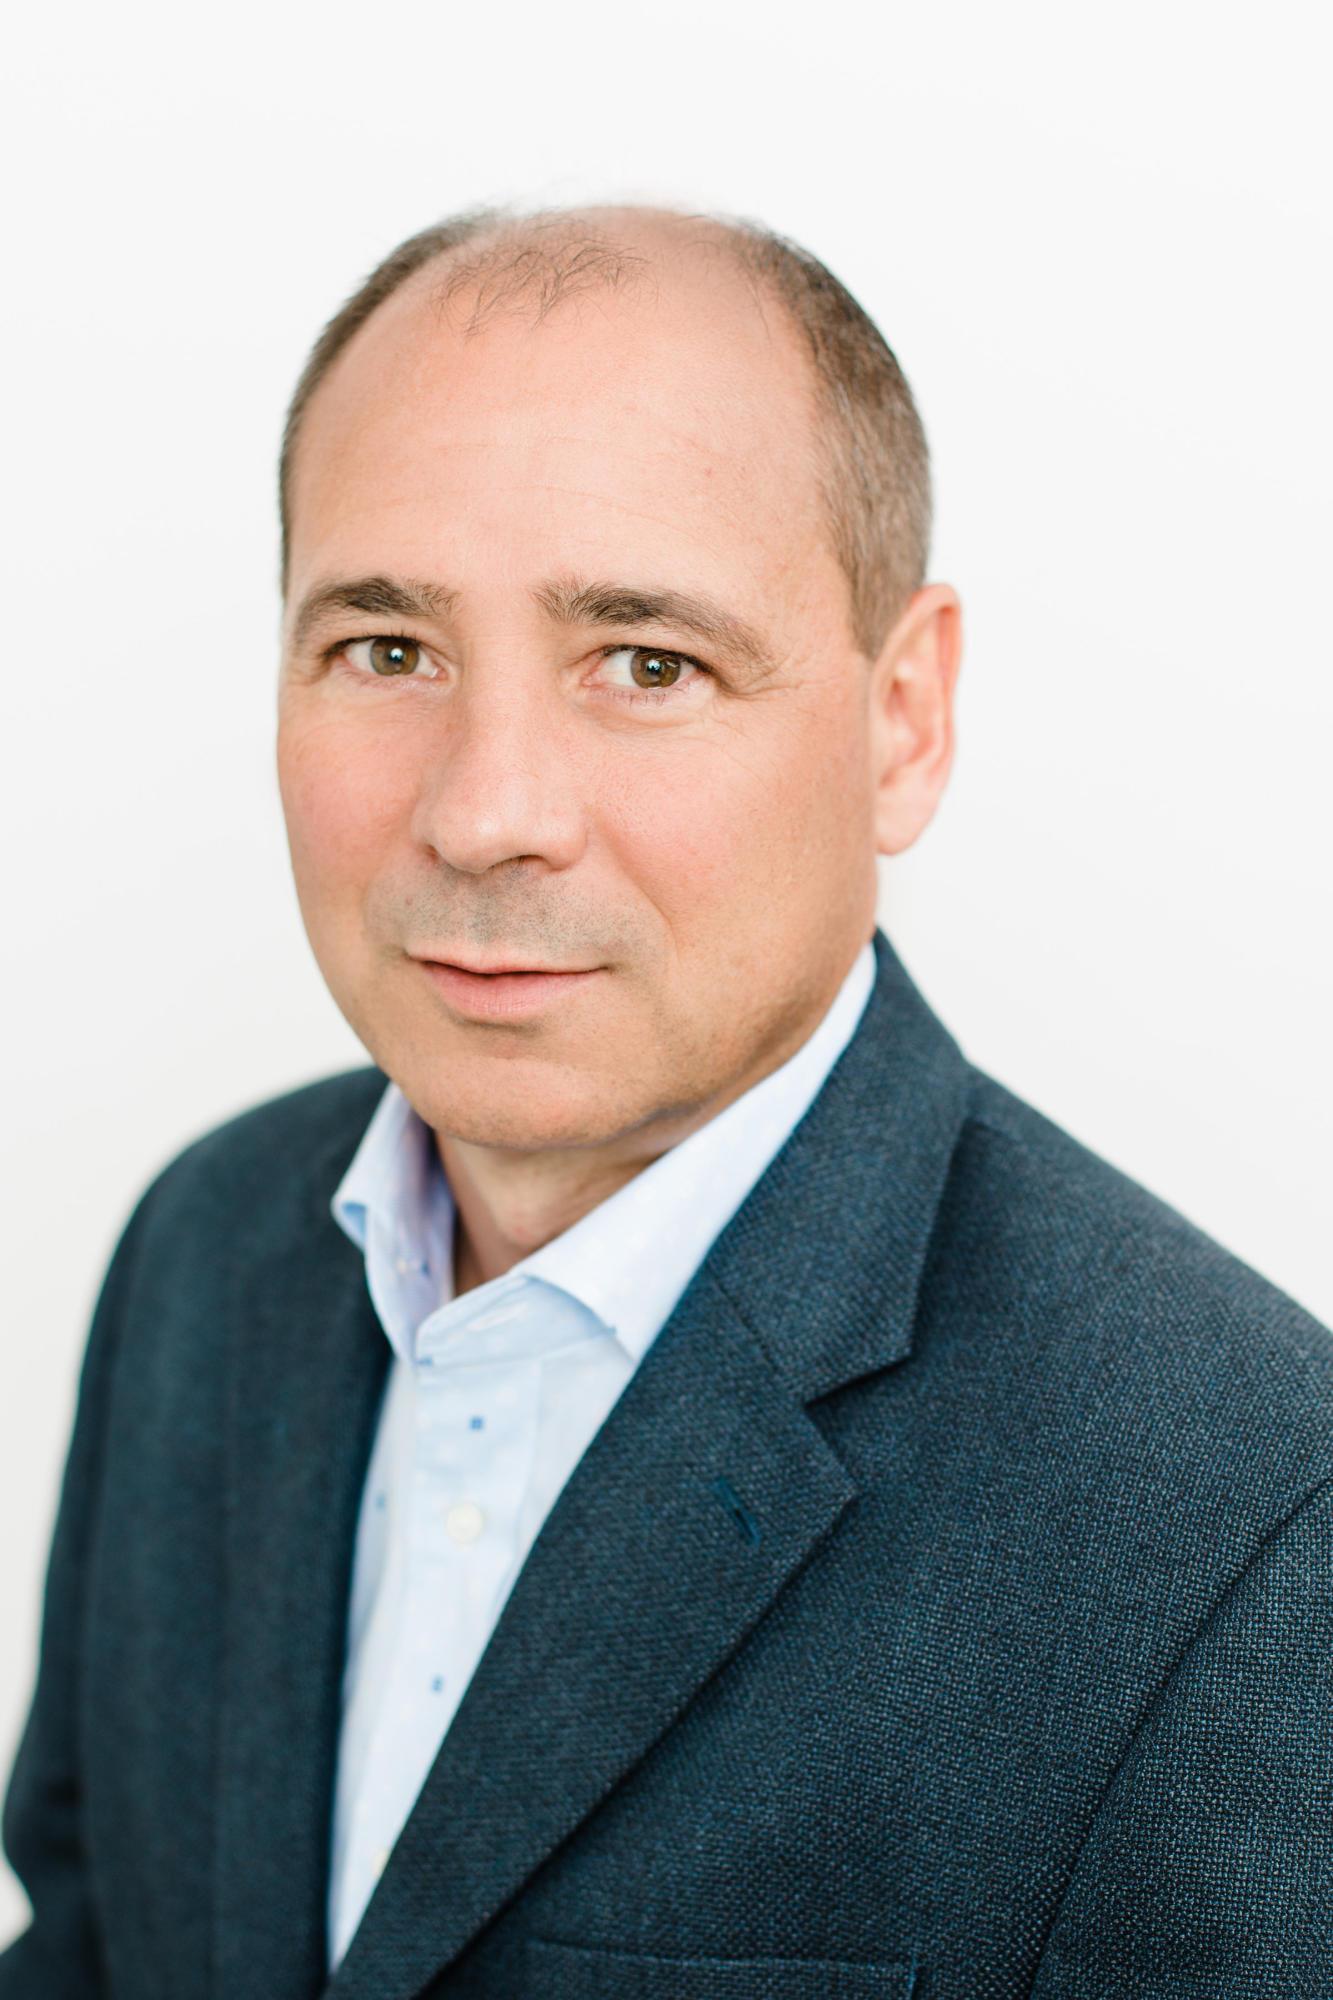 Bill Swift Chief Technology Officer Headshot